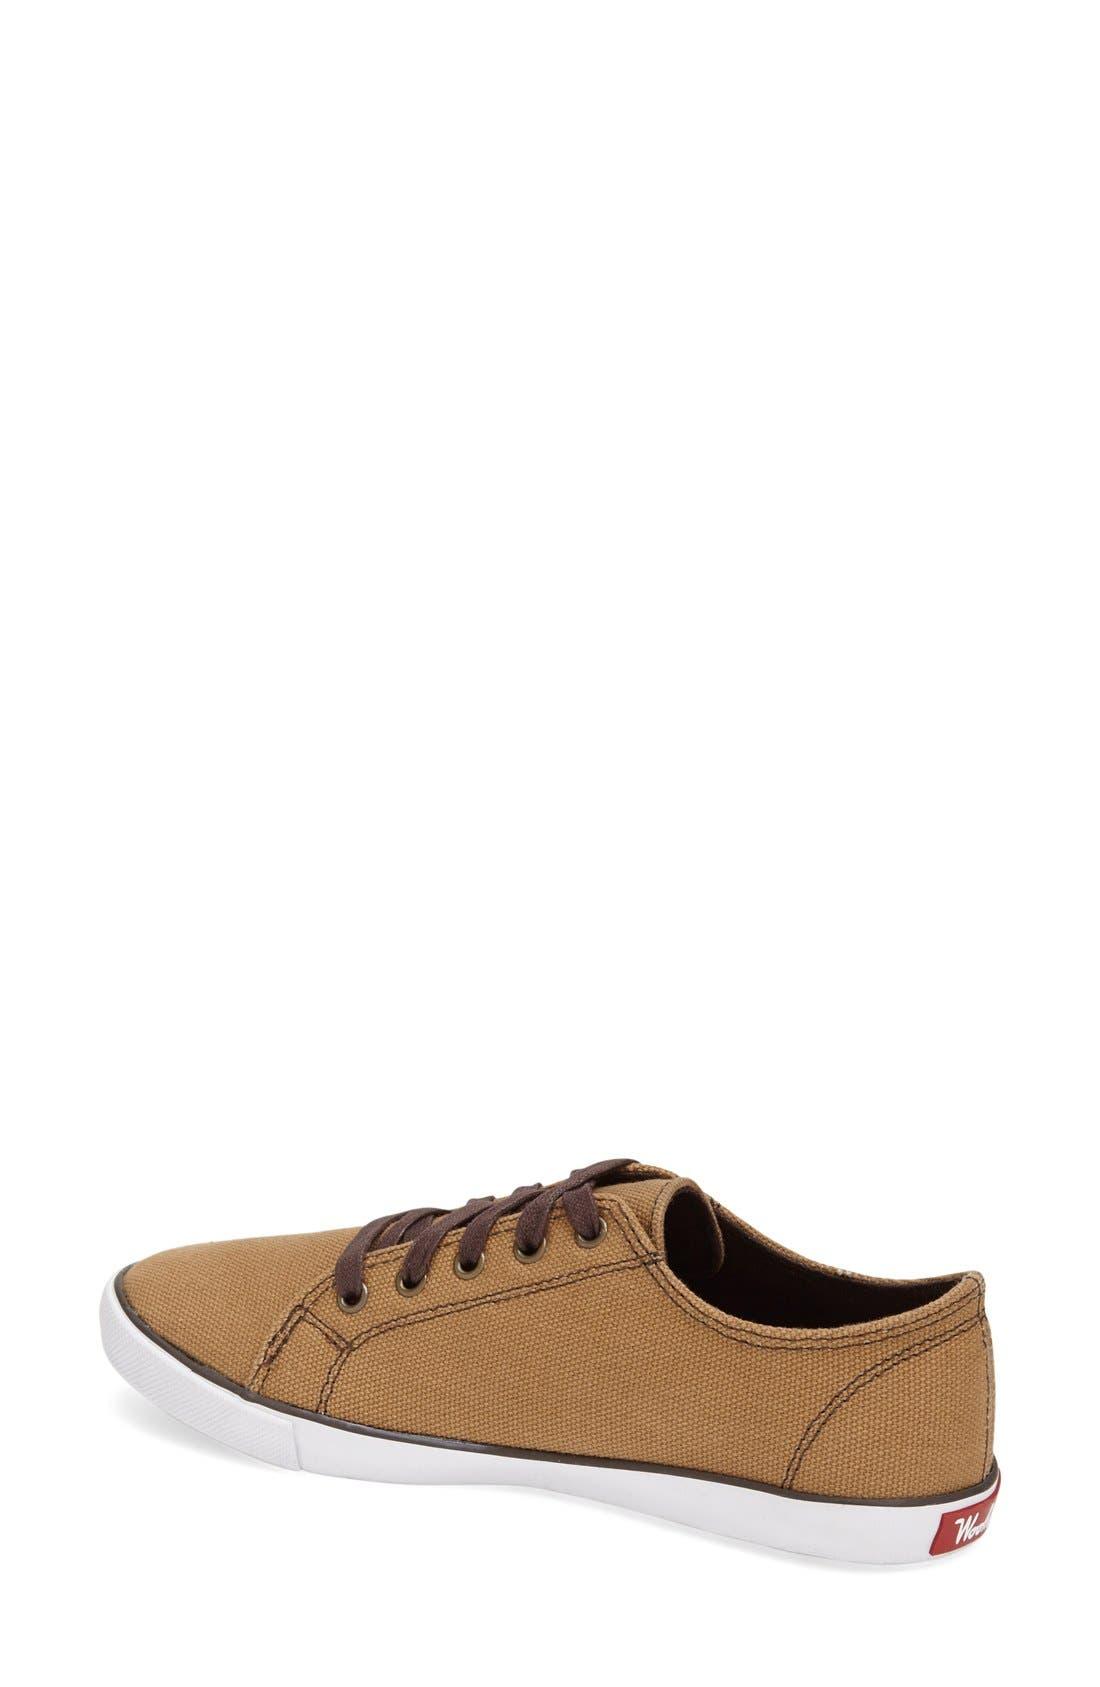 'Strand' Sneaker,                             Alternate thumbnail 2, color,                             Brush Brown Canvas